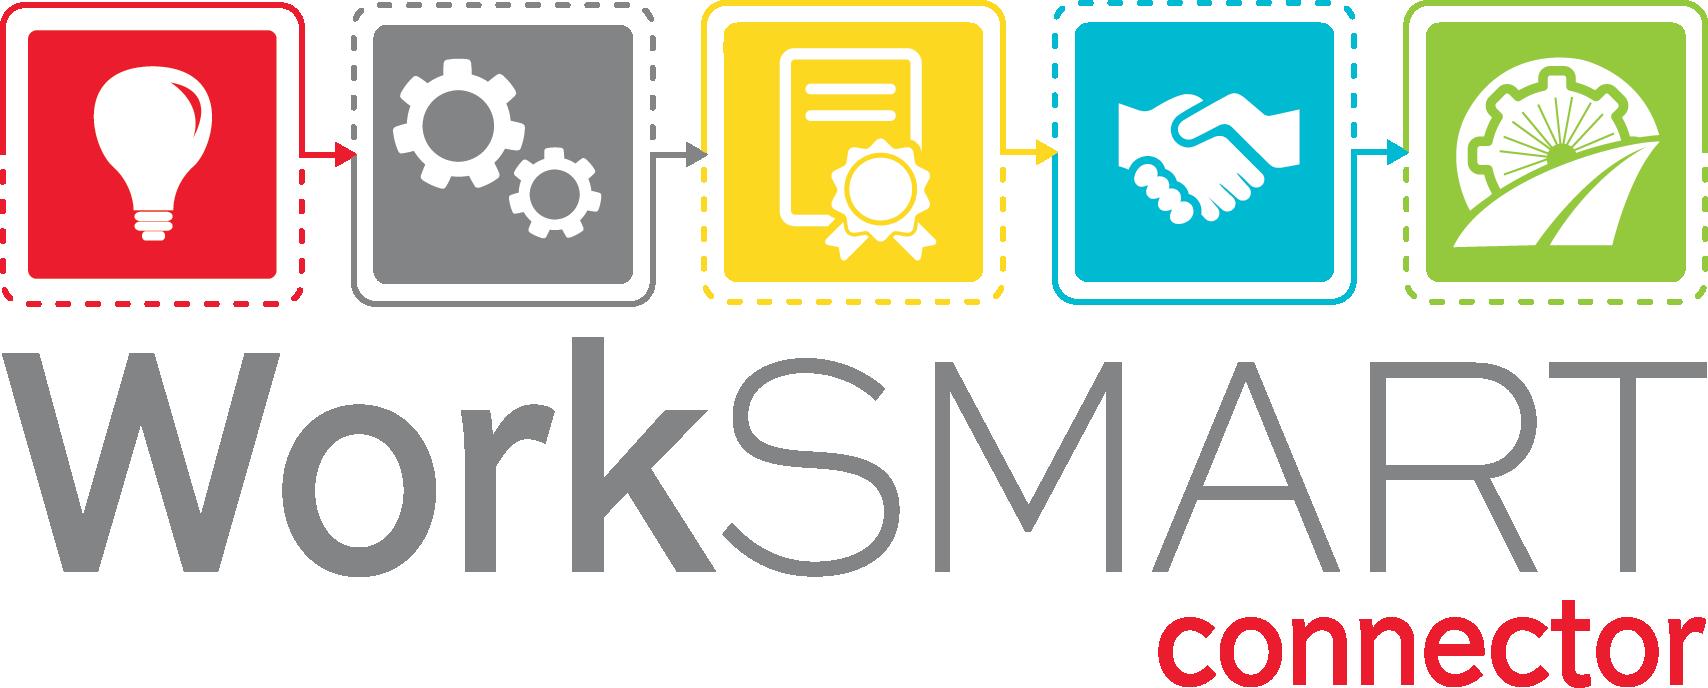 WorkSmart Connector Logo